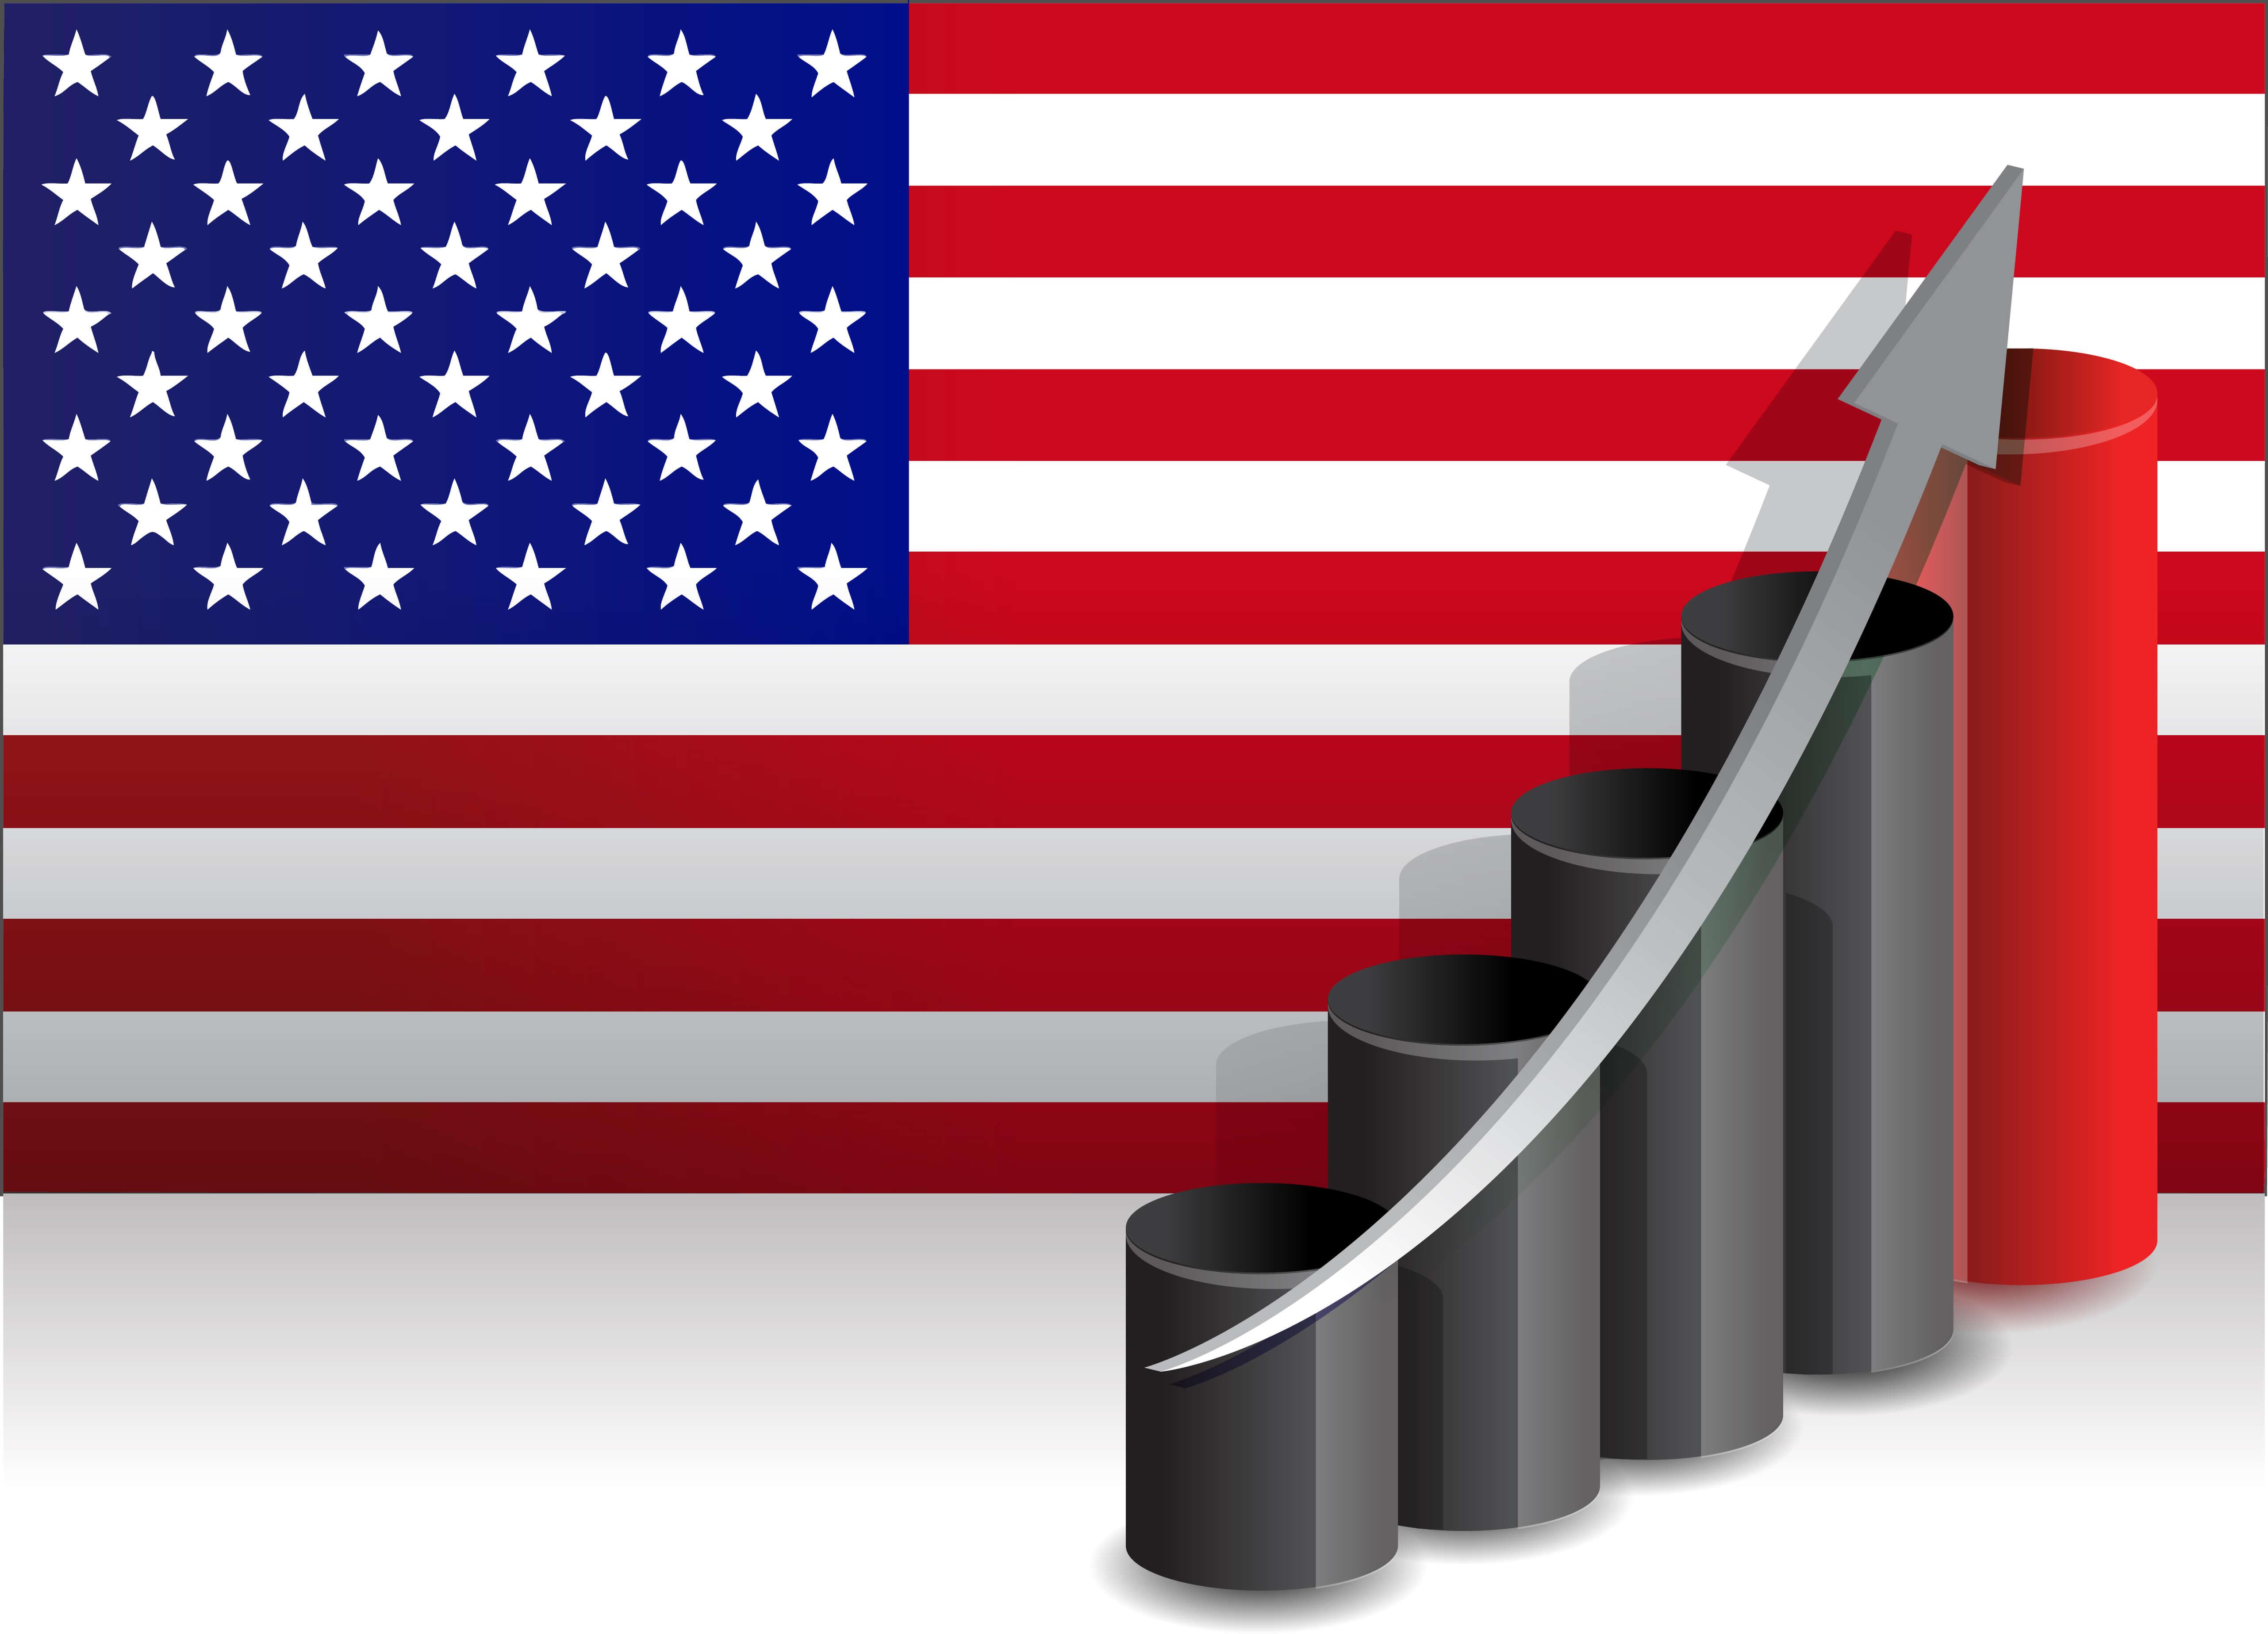 Latest jobs report is positive despite the global economic problems